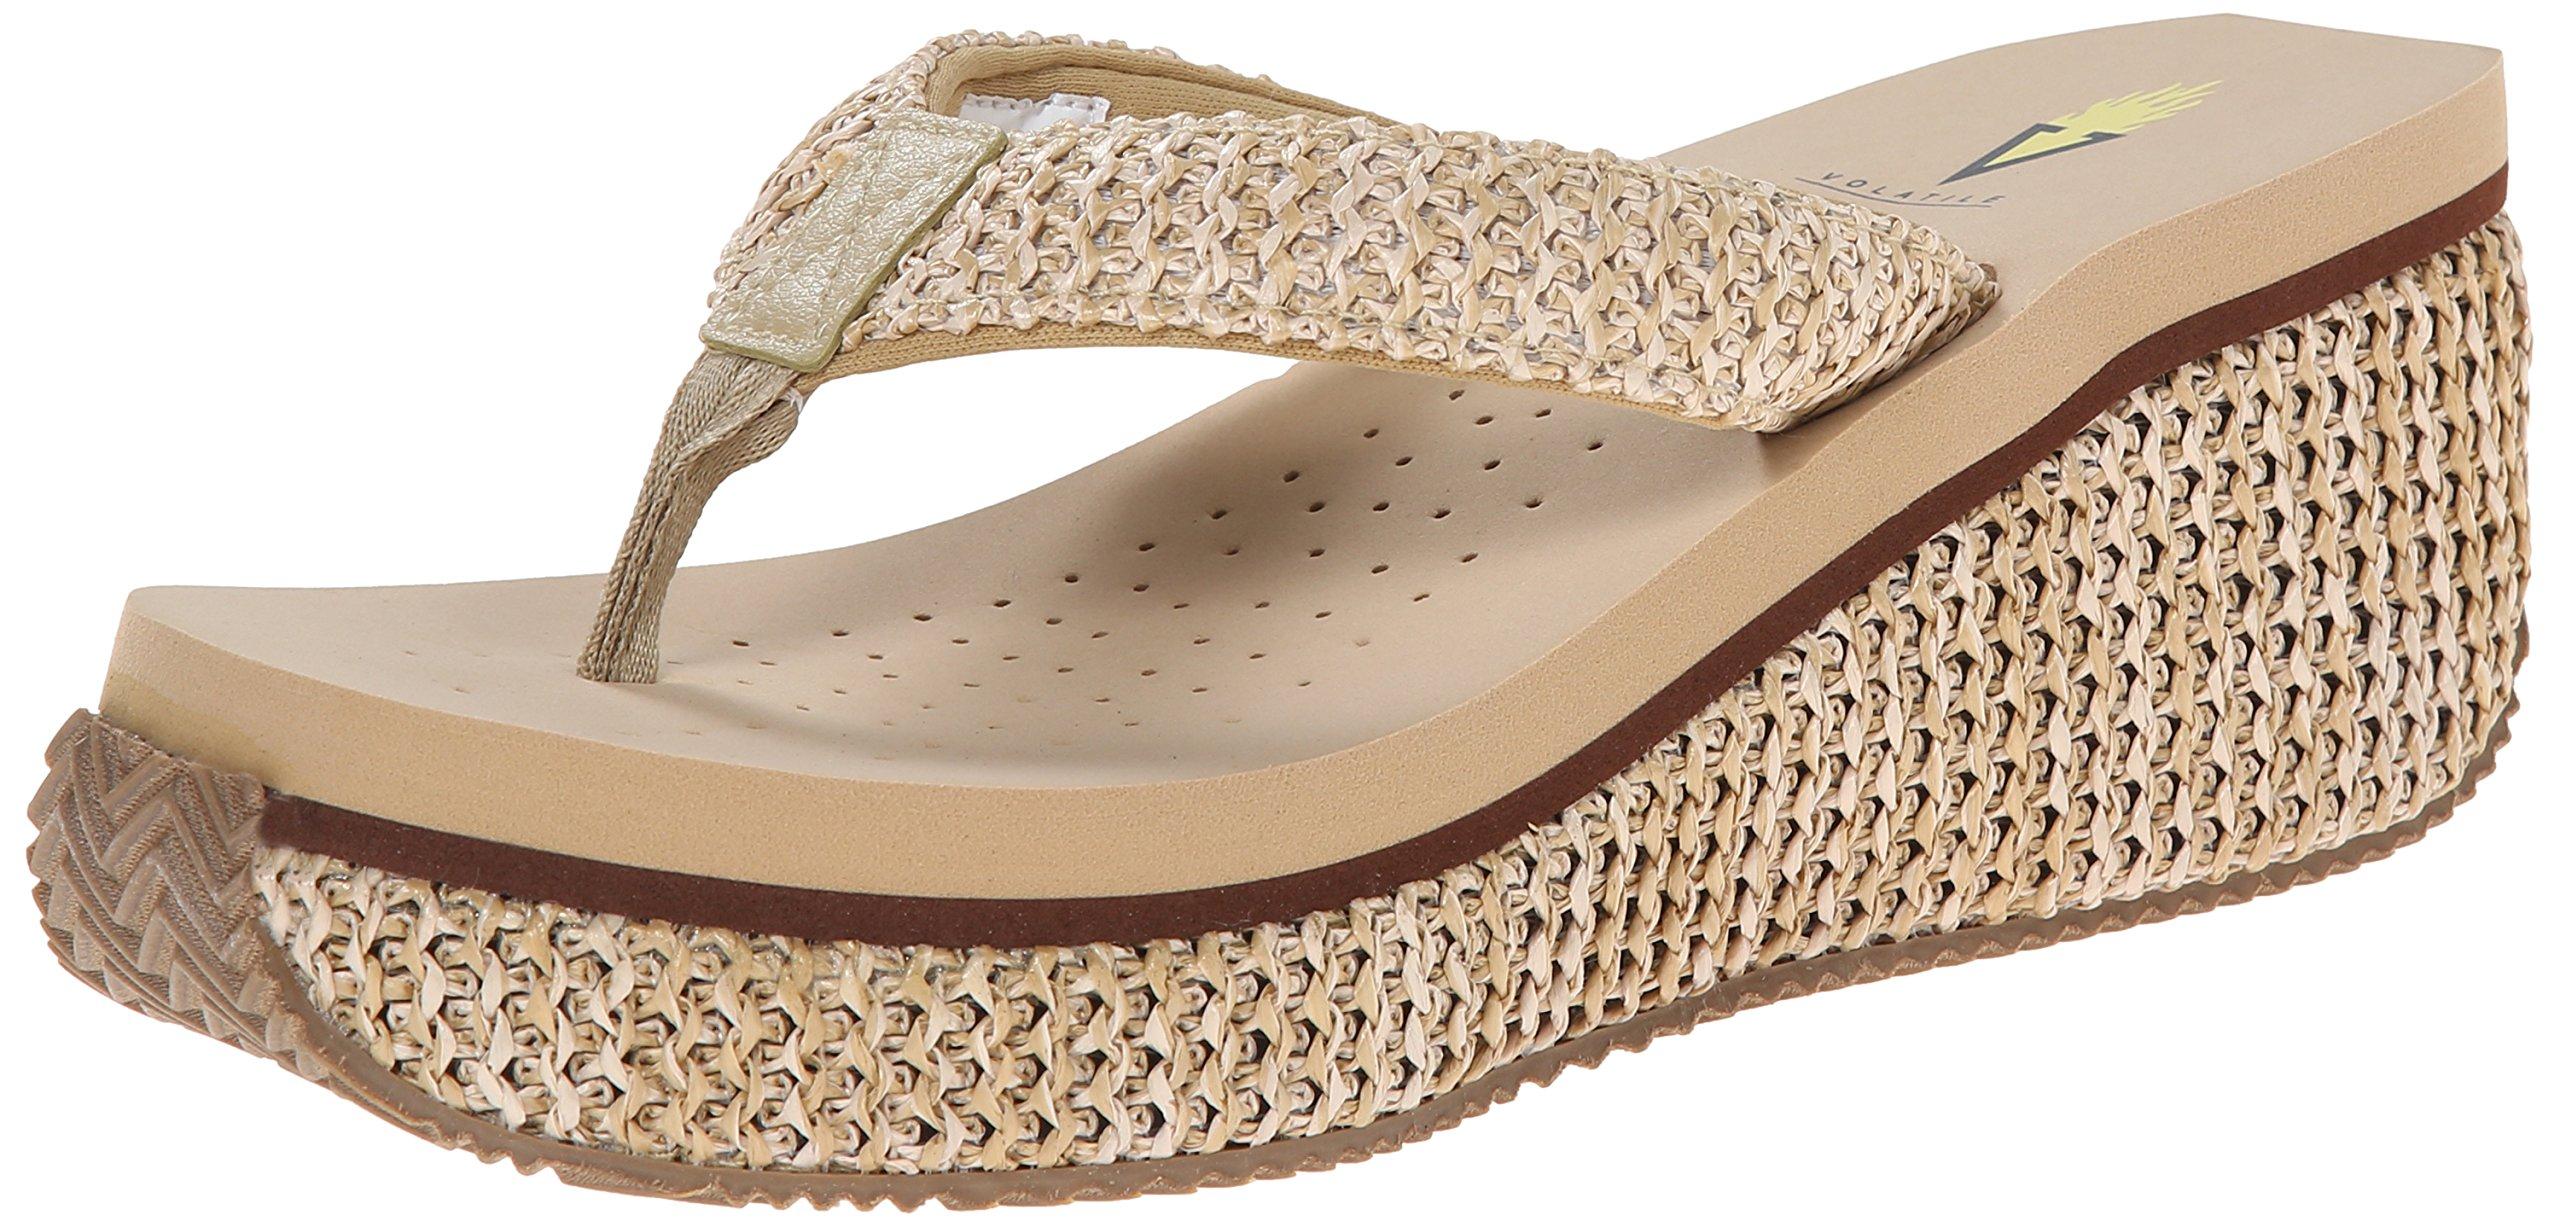 Volatile Women's Island Wedge Sandal, Natural, 8 B US by VOLATILE